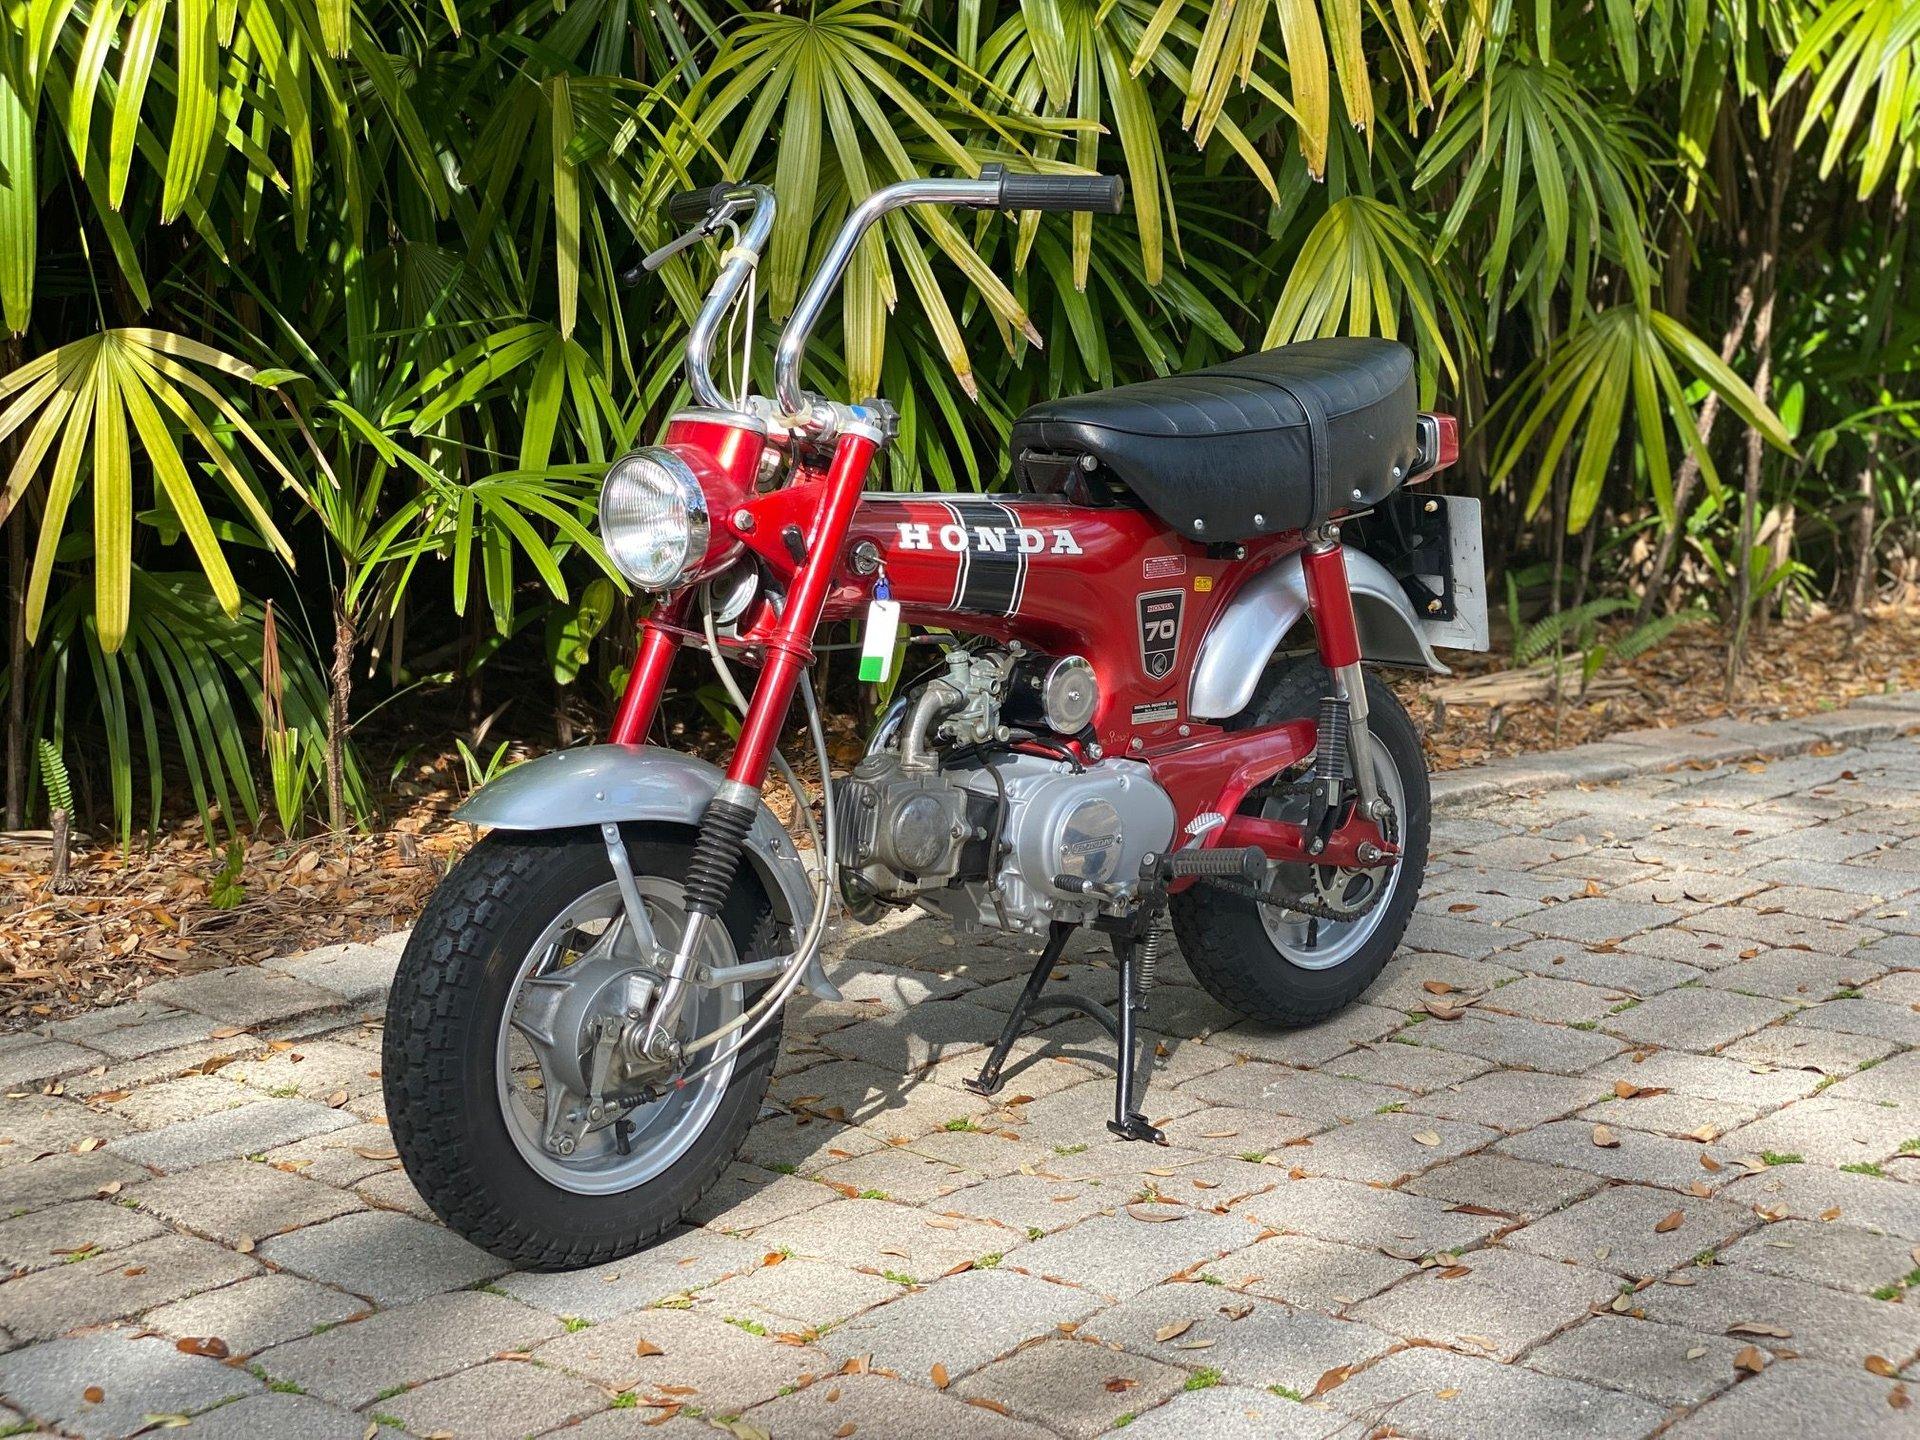 1977 honda st70 minibike